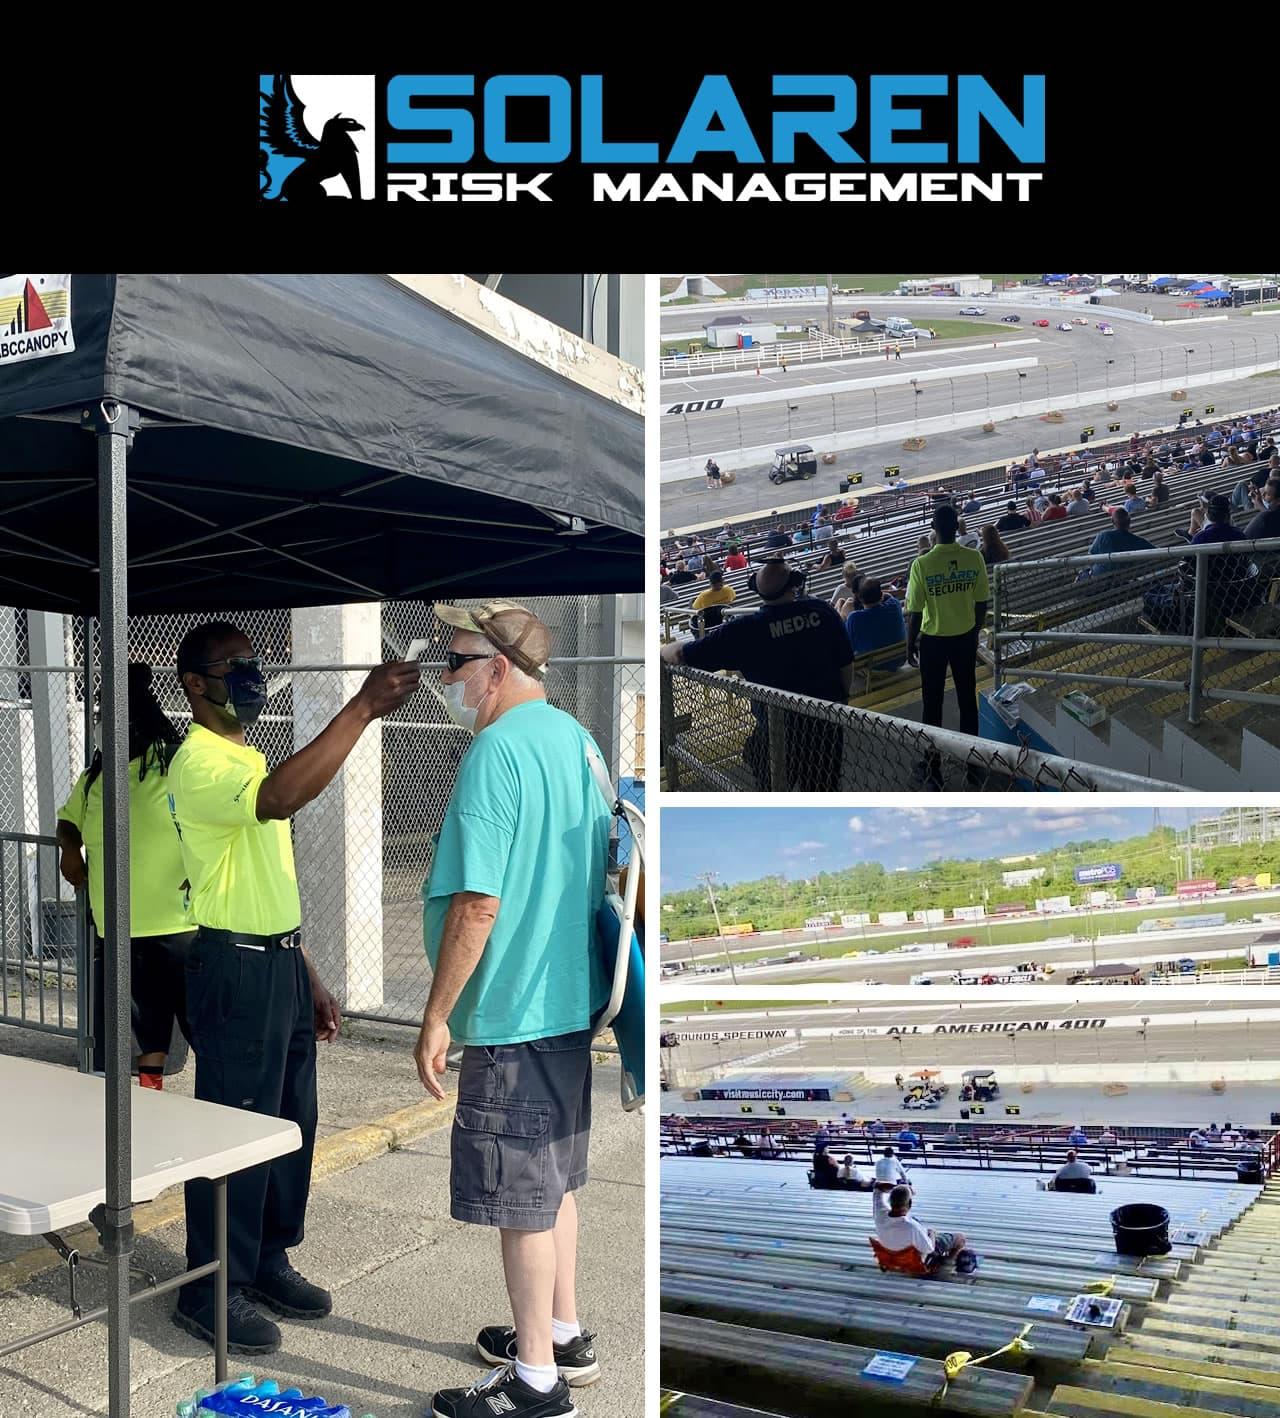 solaren-event-security-nashville-speedway-fairgrounds-3